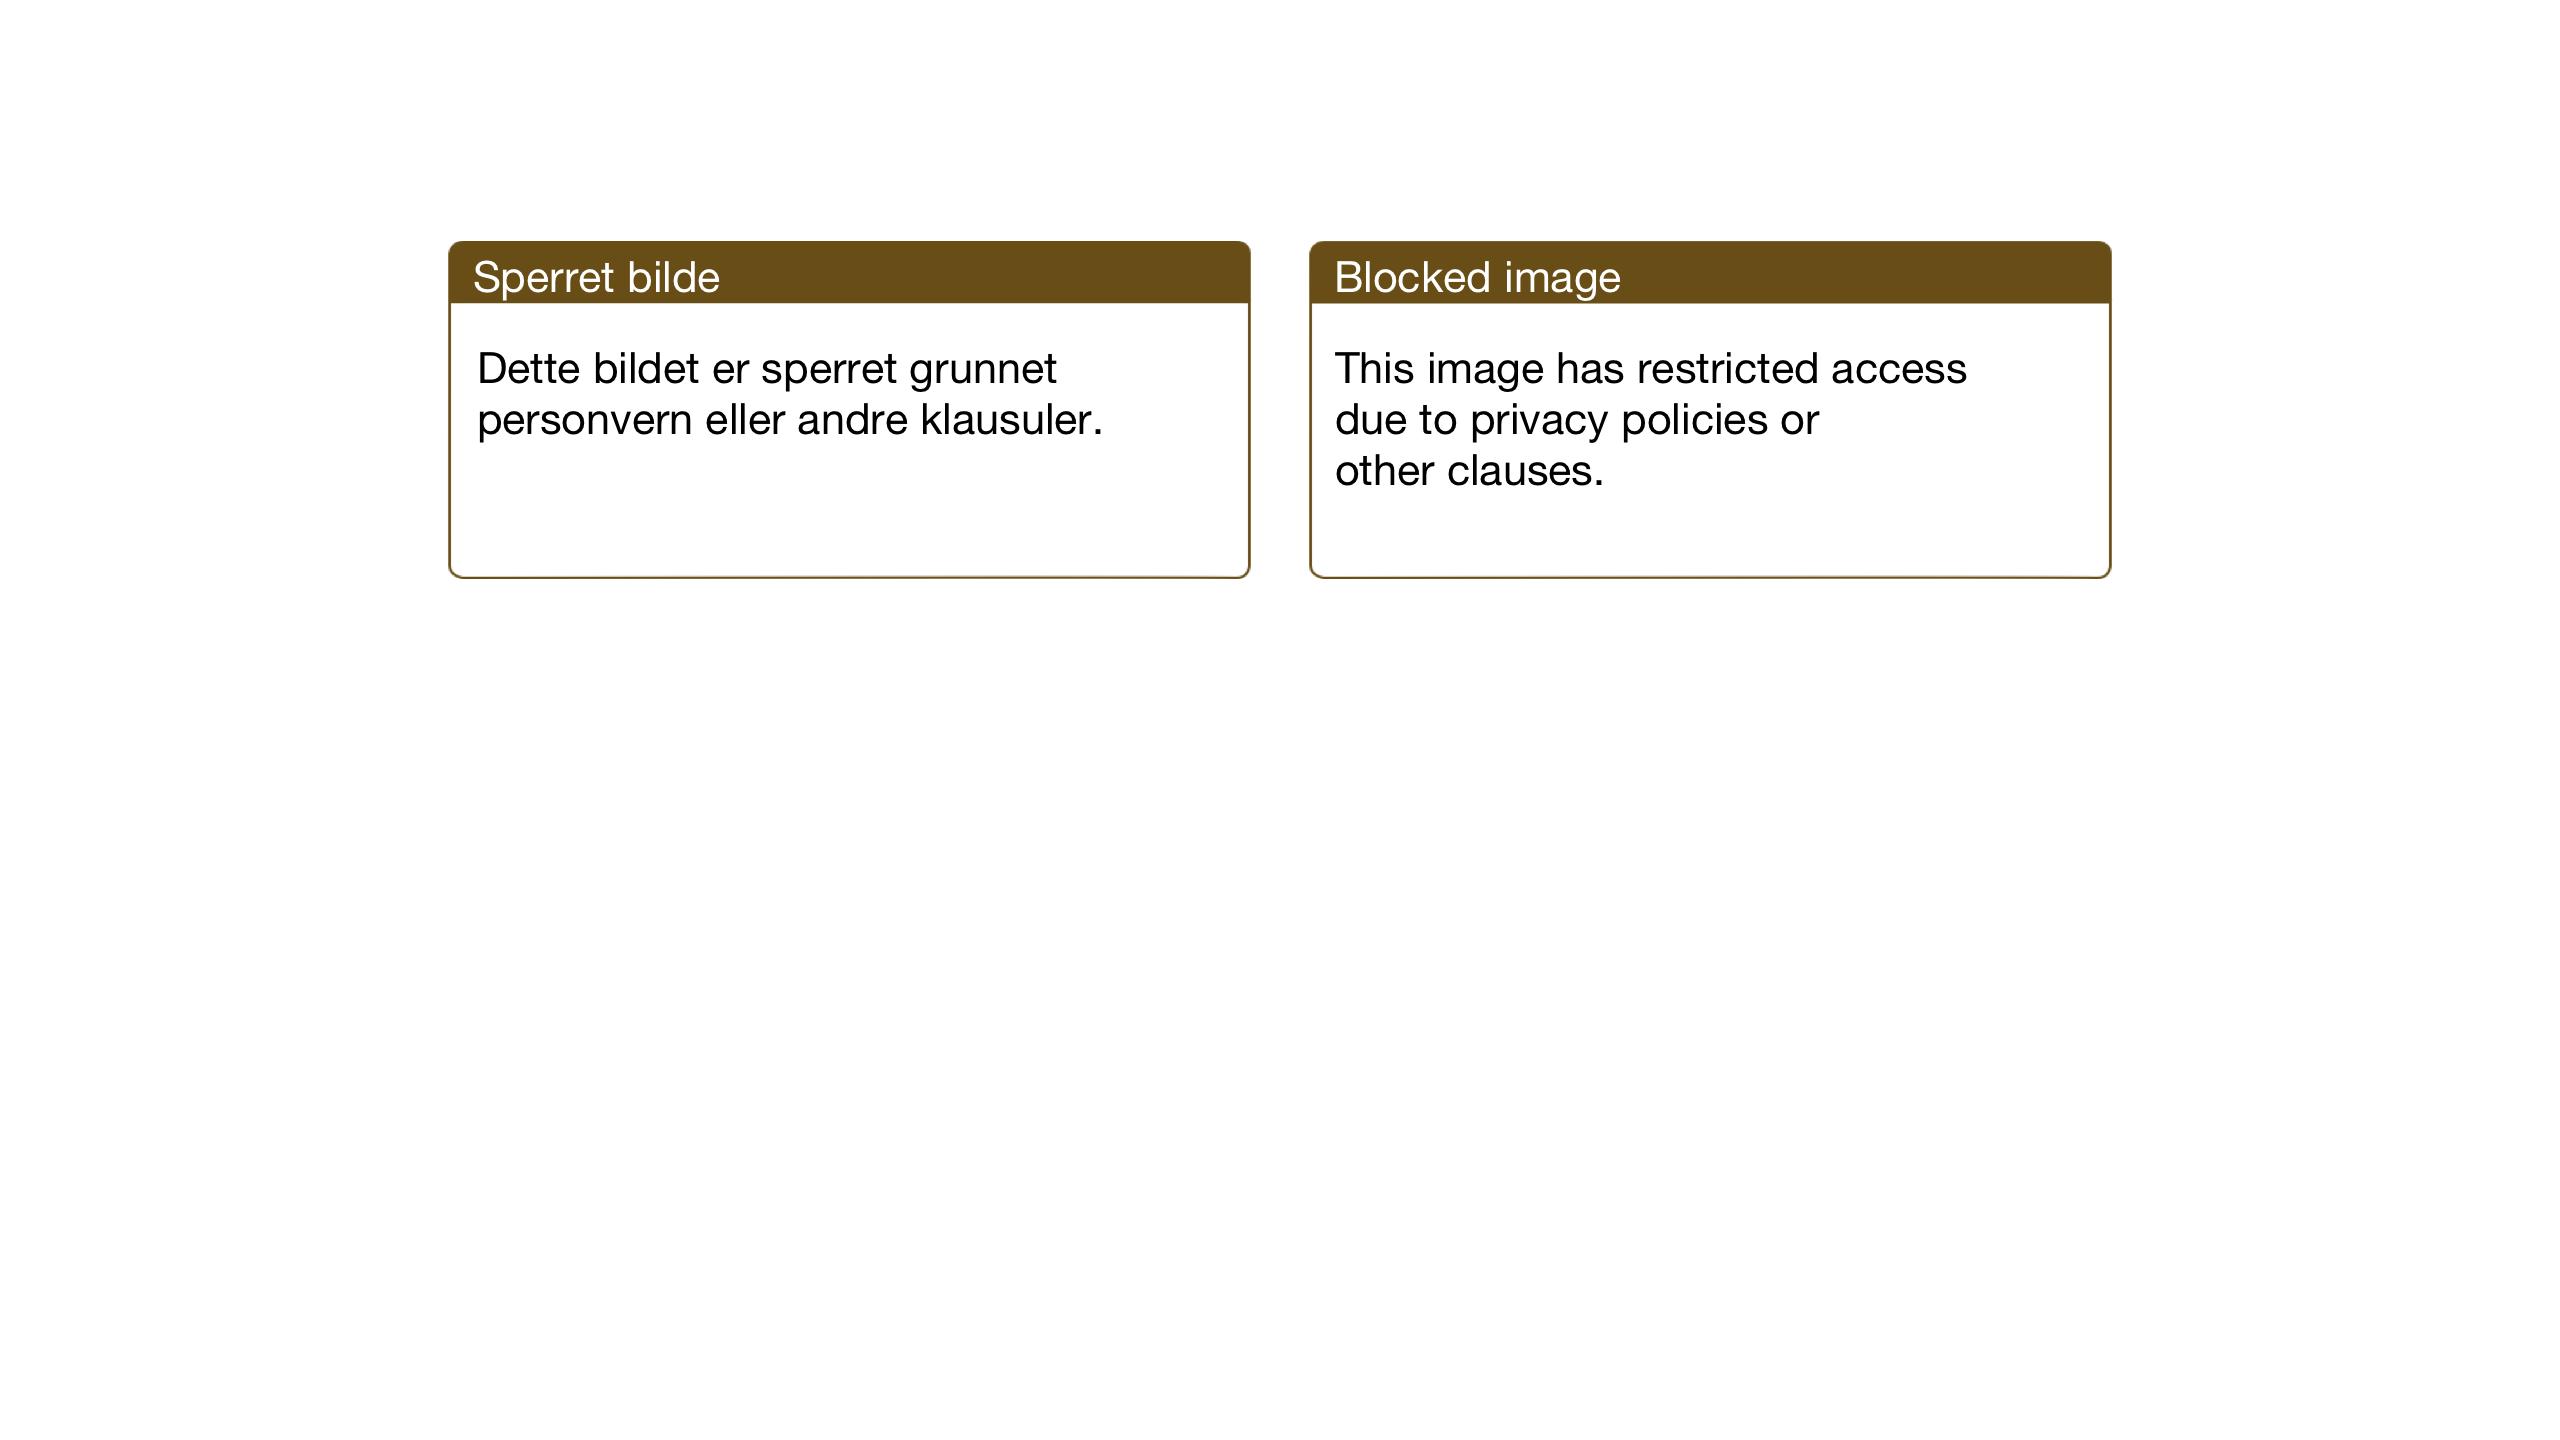 SAH, Vardal prestekontor, H/Ha/Haa/L0018: Ministerialbok nr. 18, 1930-1945, s. 177